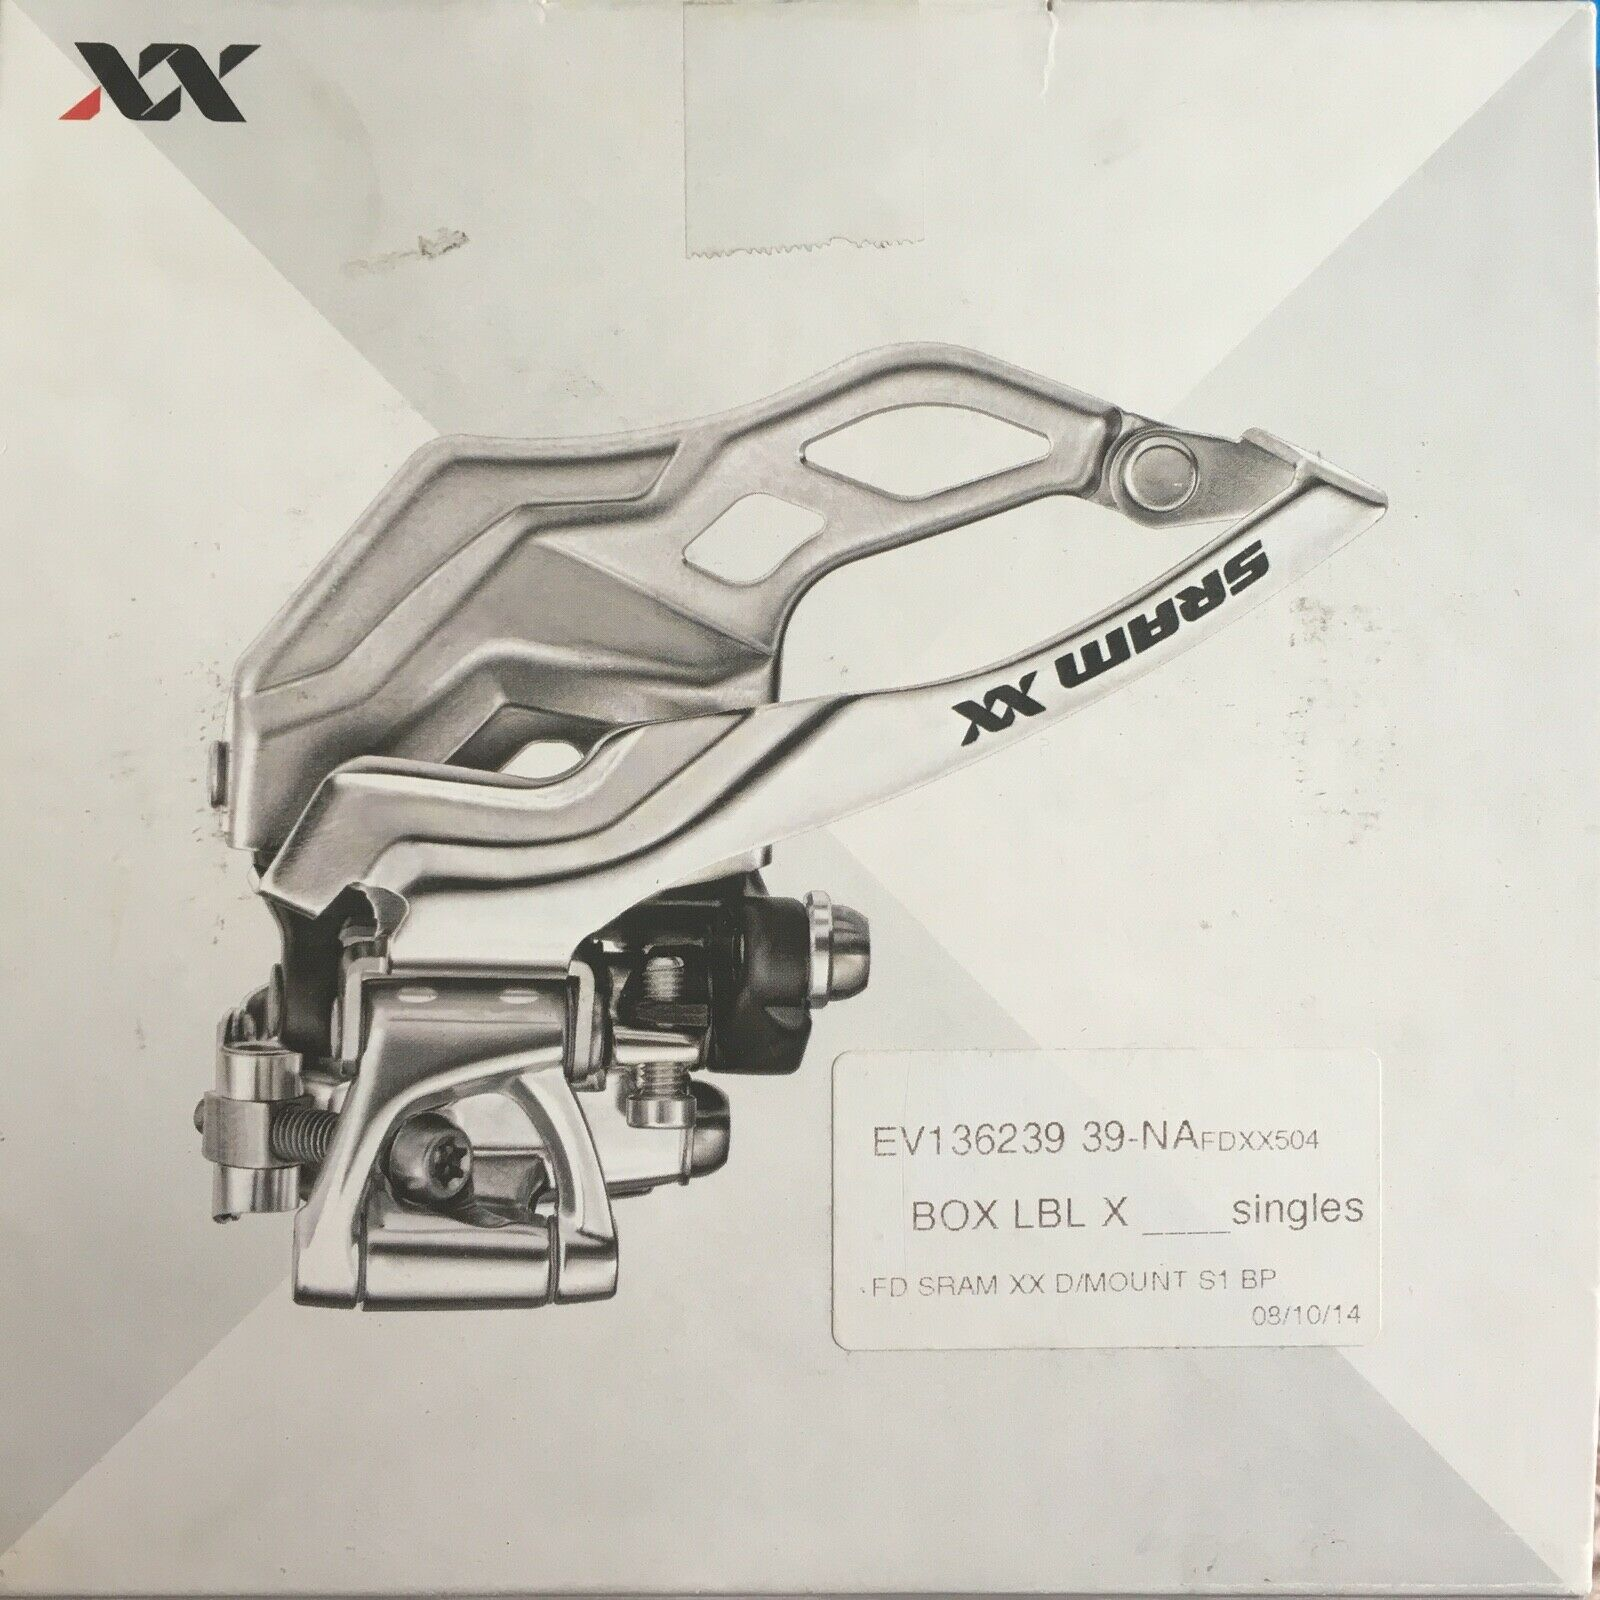 Antiguo desCocherilador SRAM XX s1